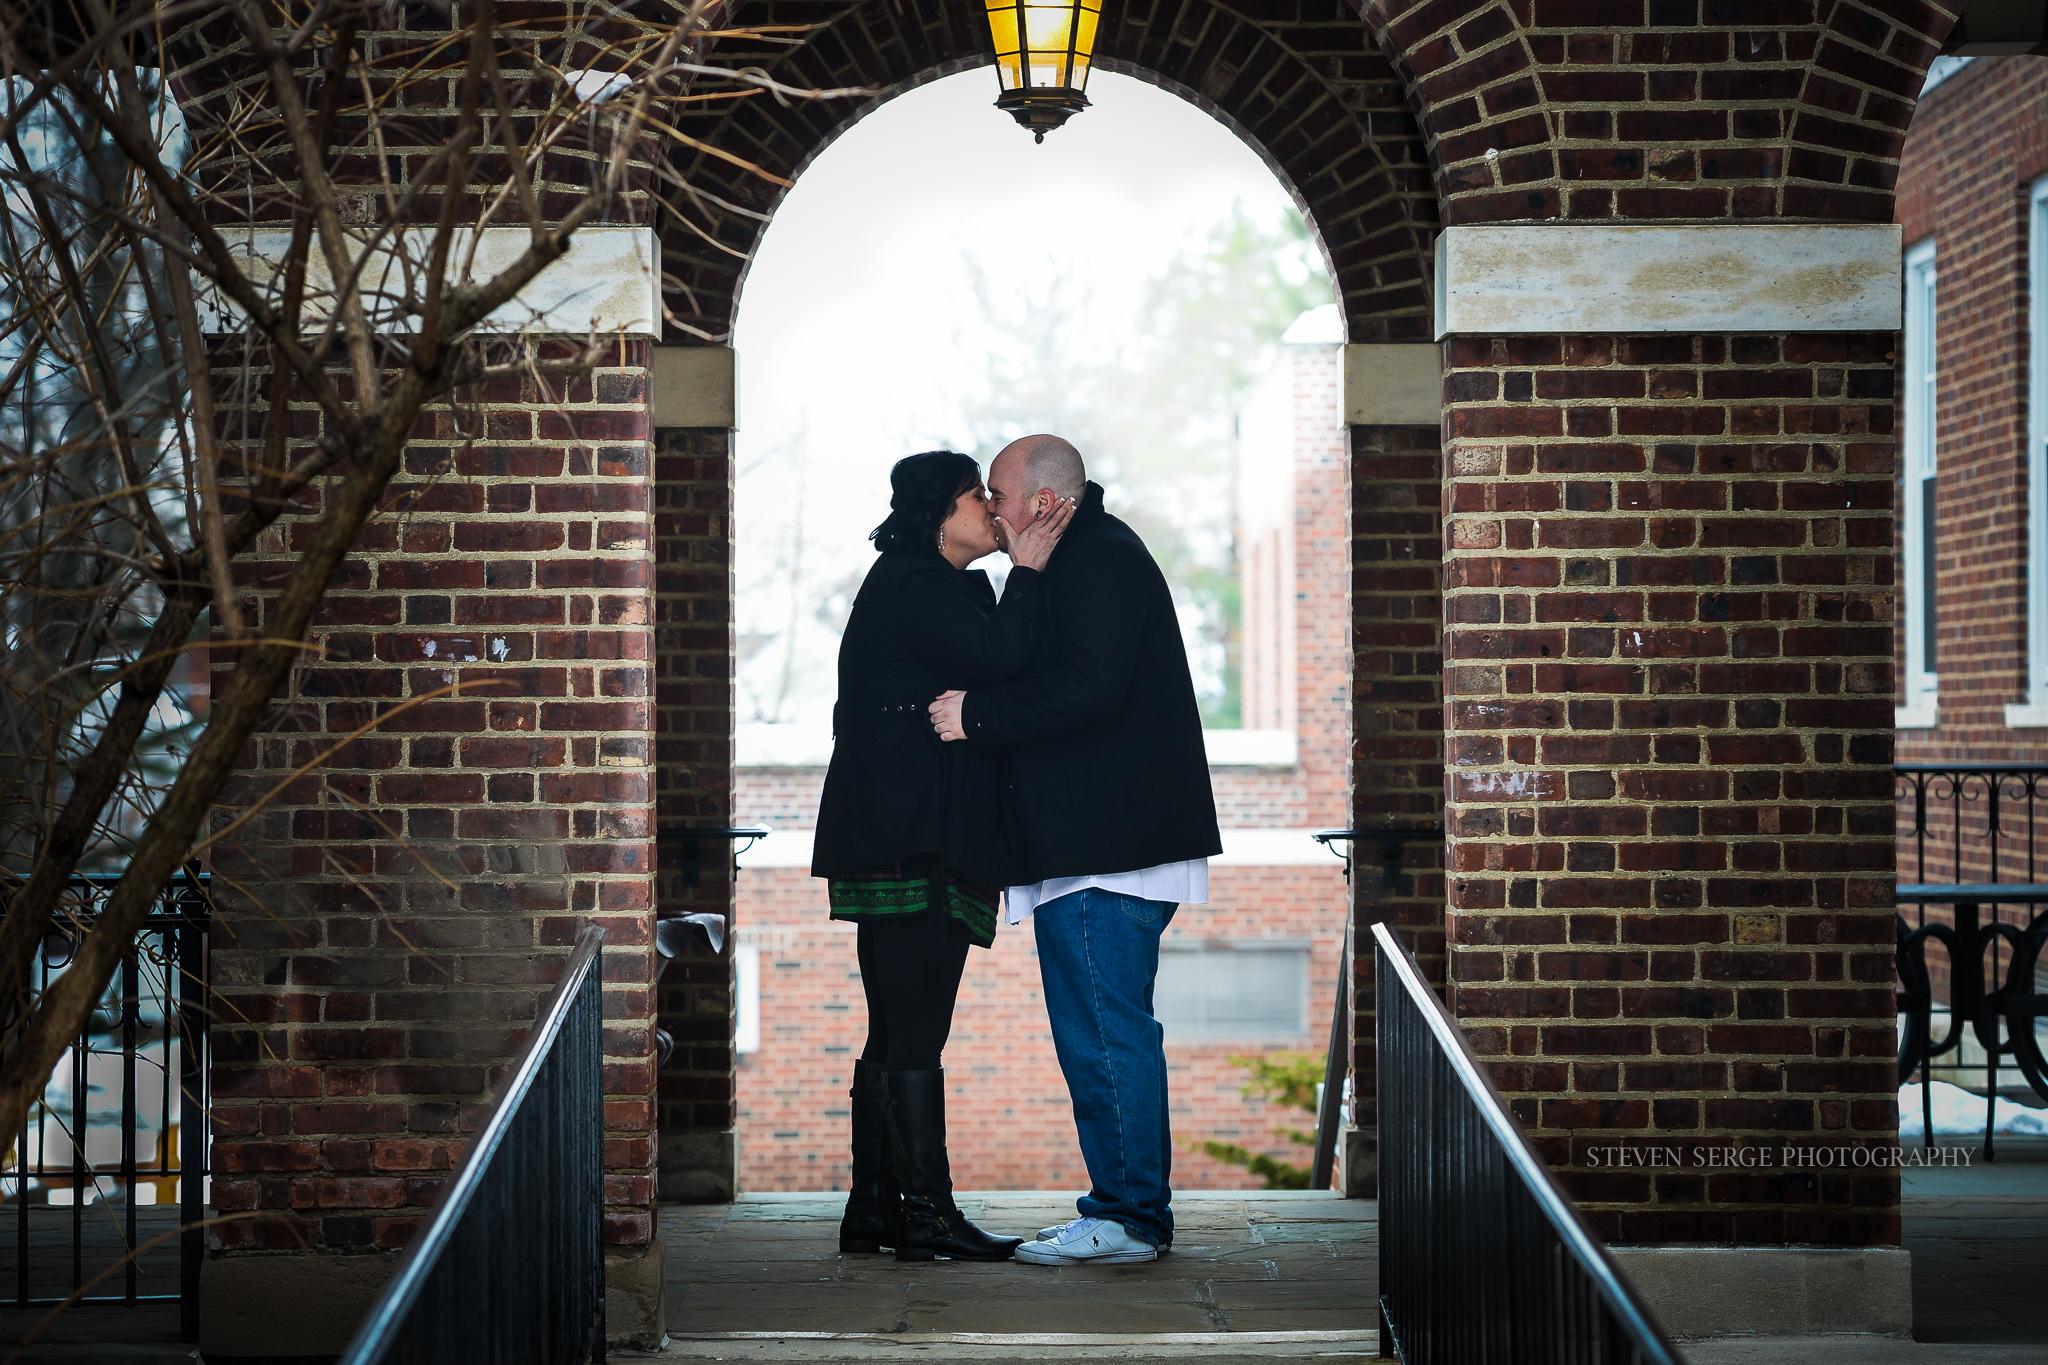 Rosa-NEPA-Wedding-Engagement-Photographer-Waverly-Clarks-Summit-Scranton-Photographer-20.jpg